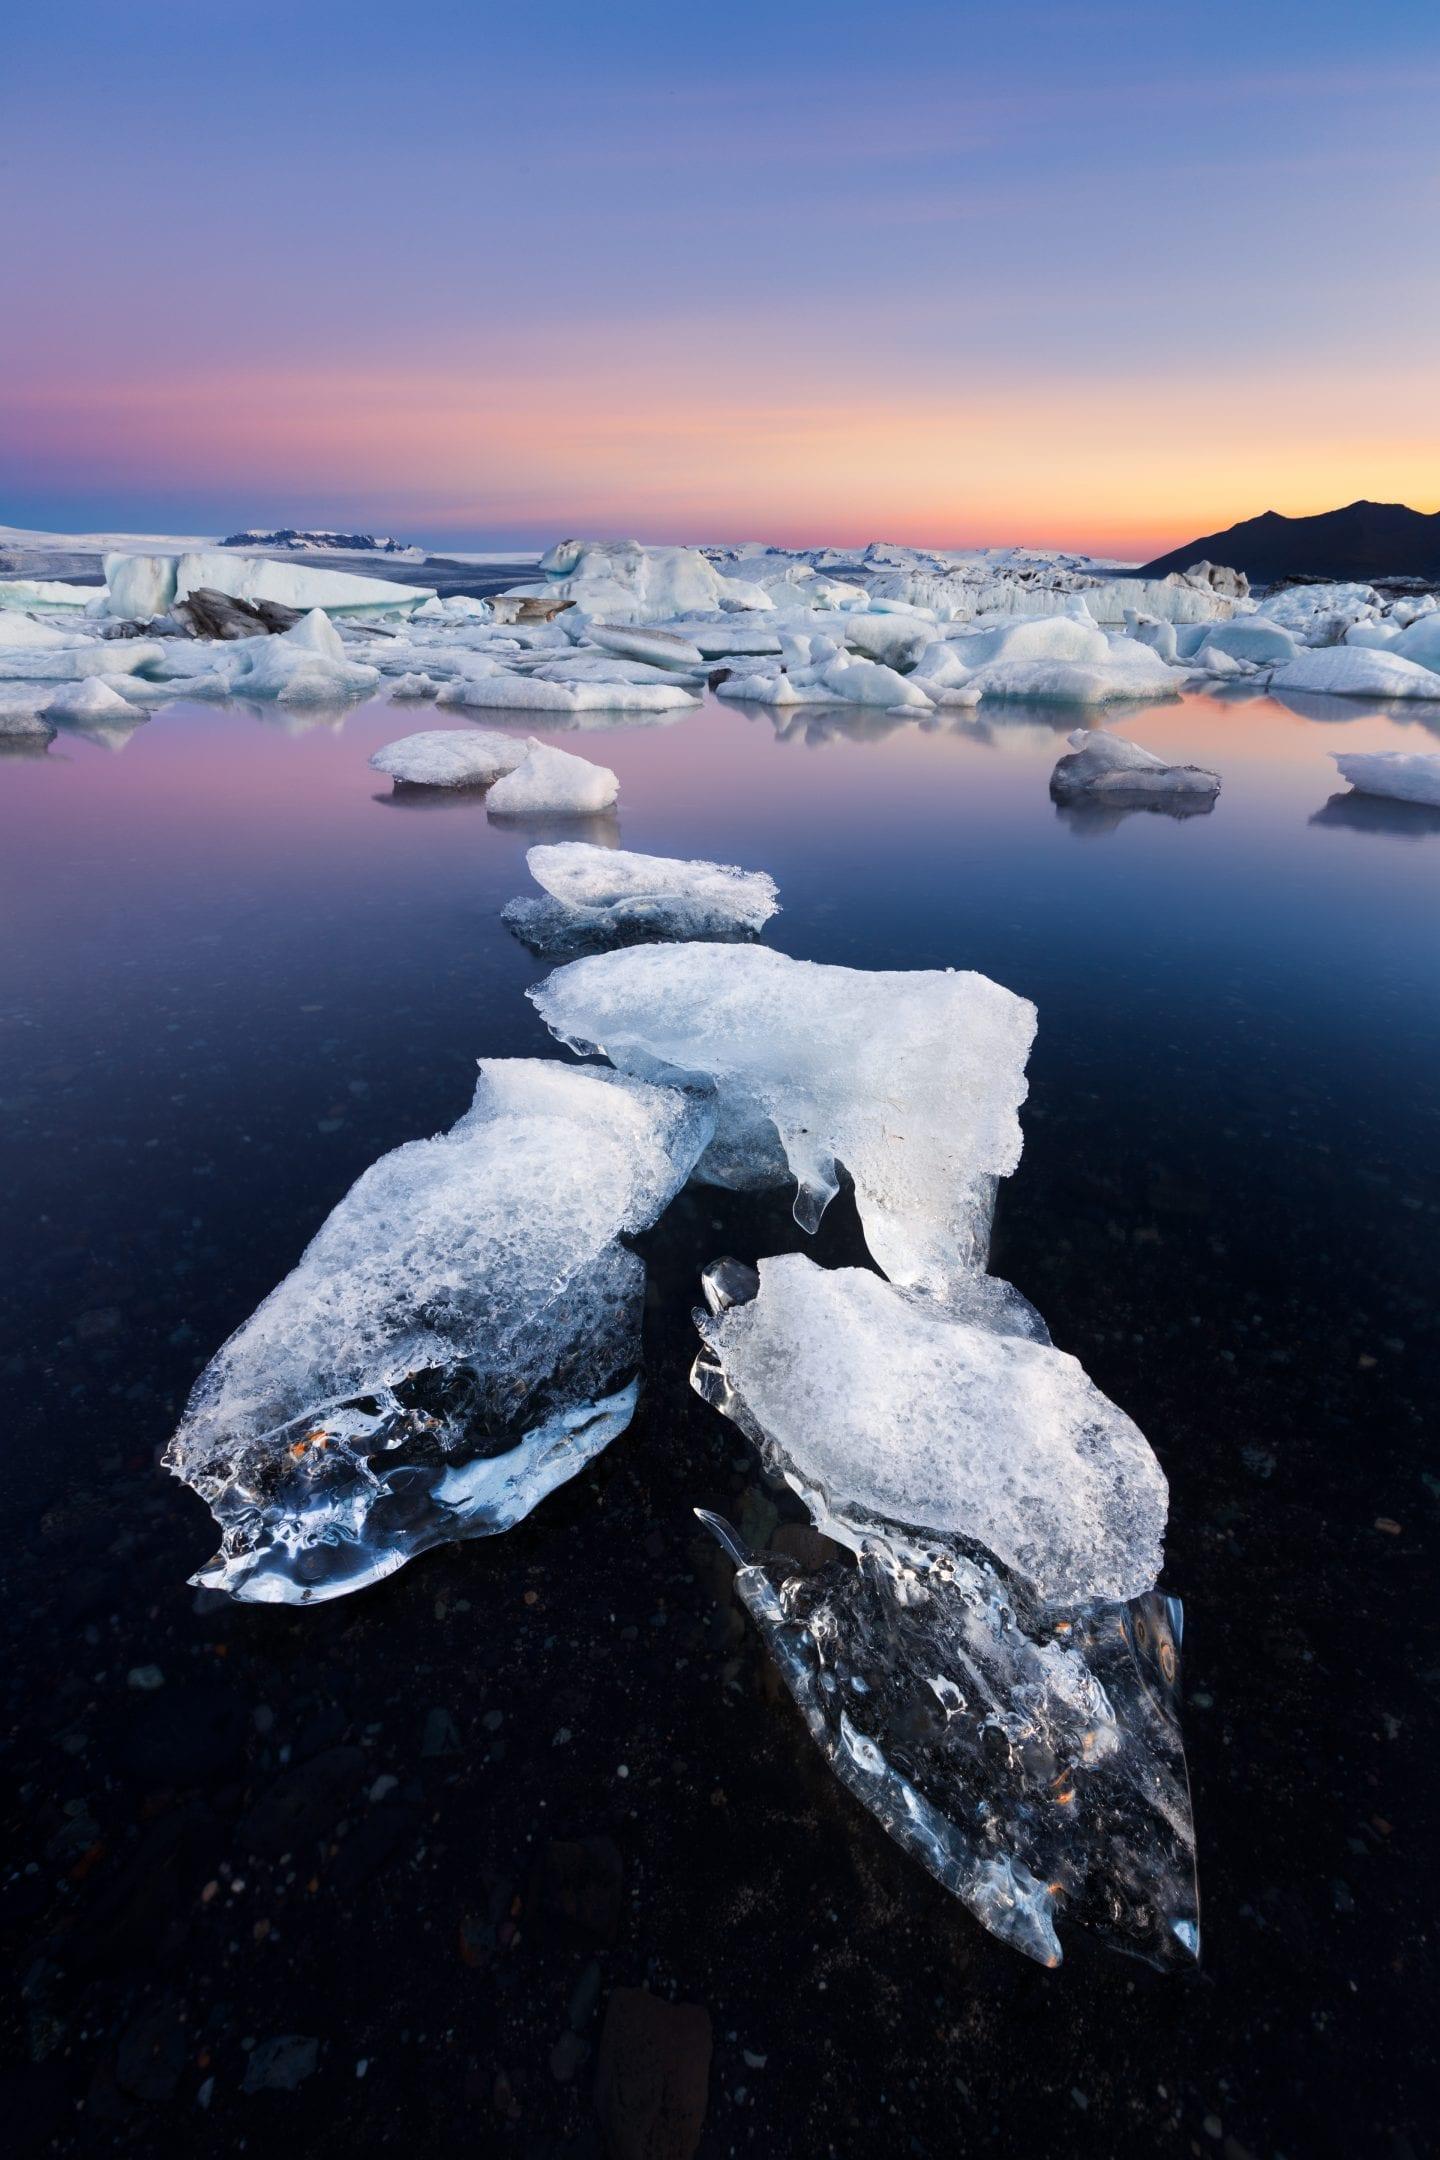 European Bucket list stop, glacier lagoon in Iceland